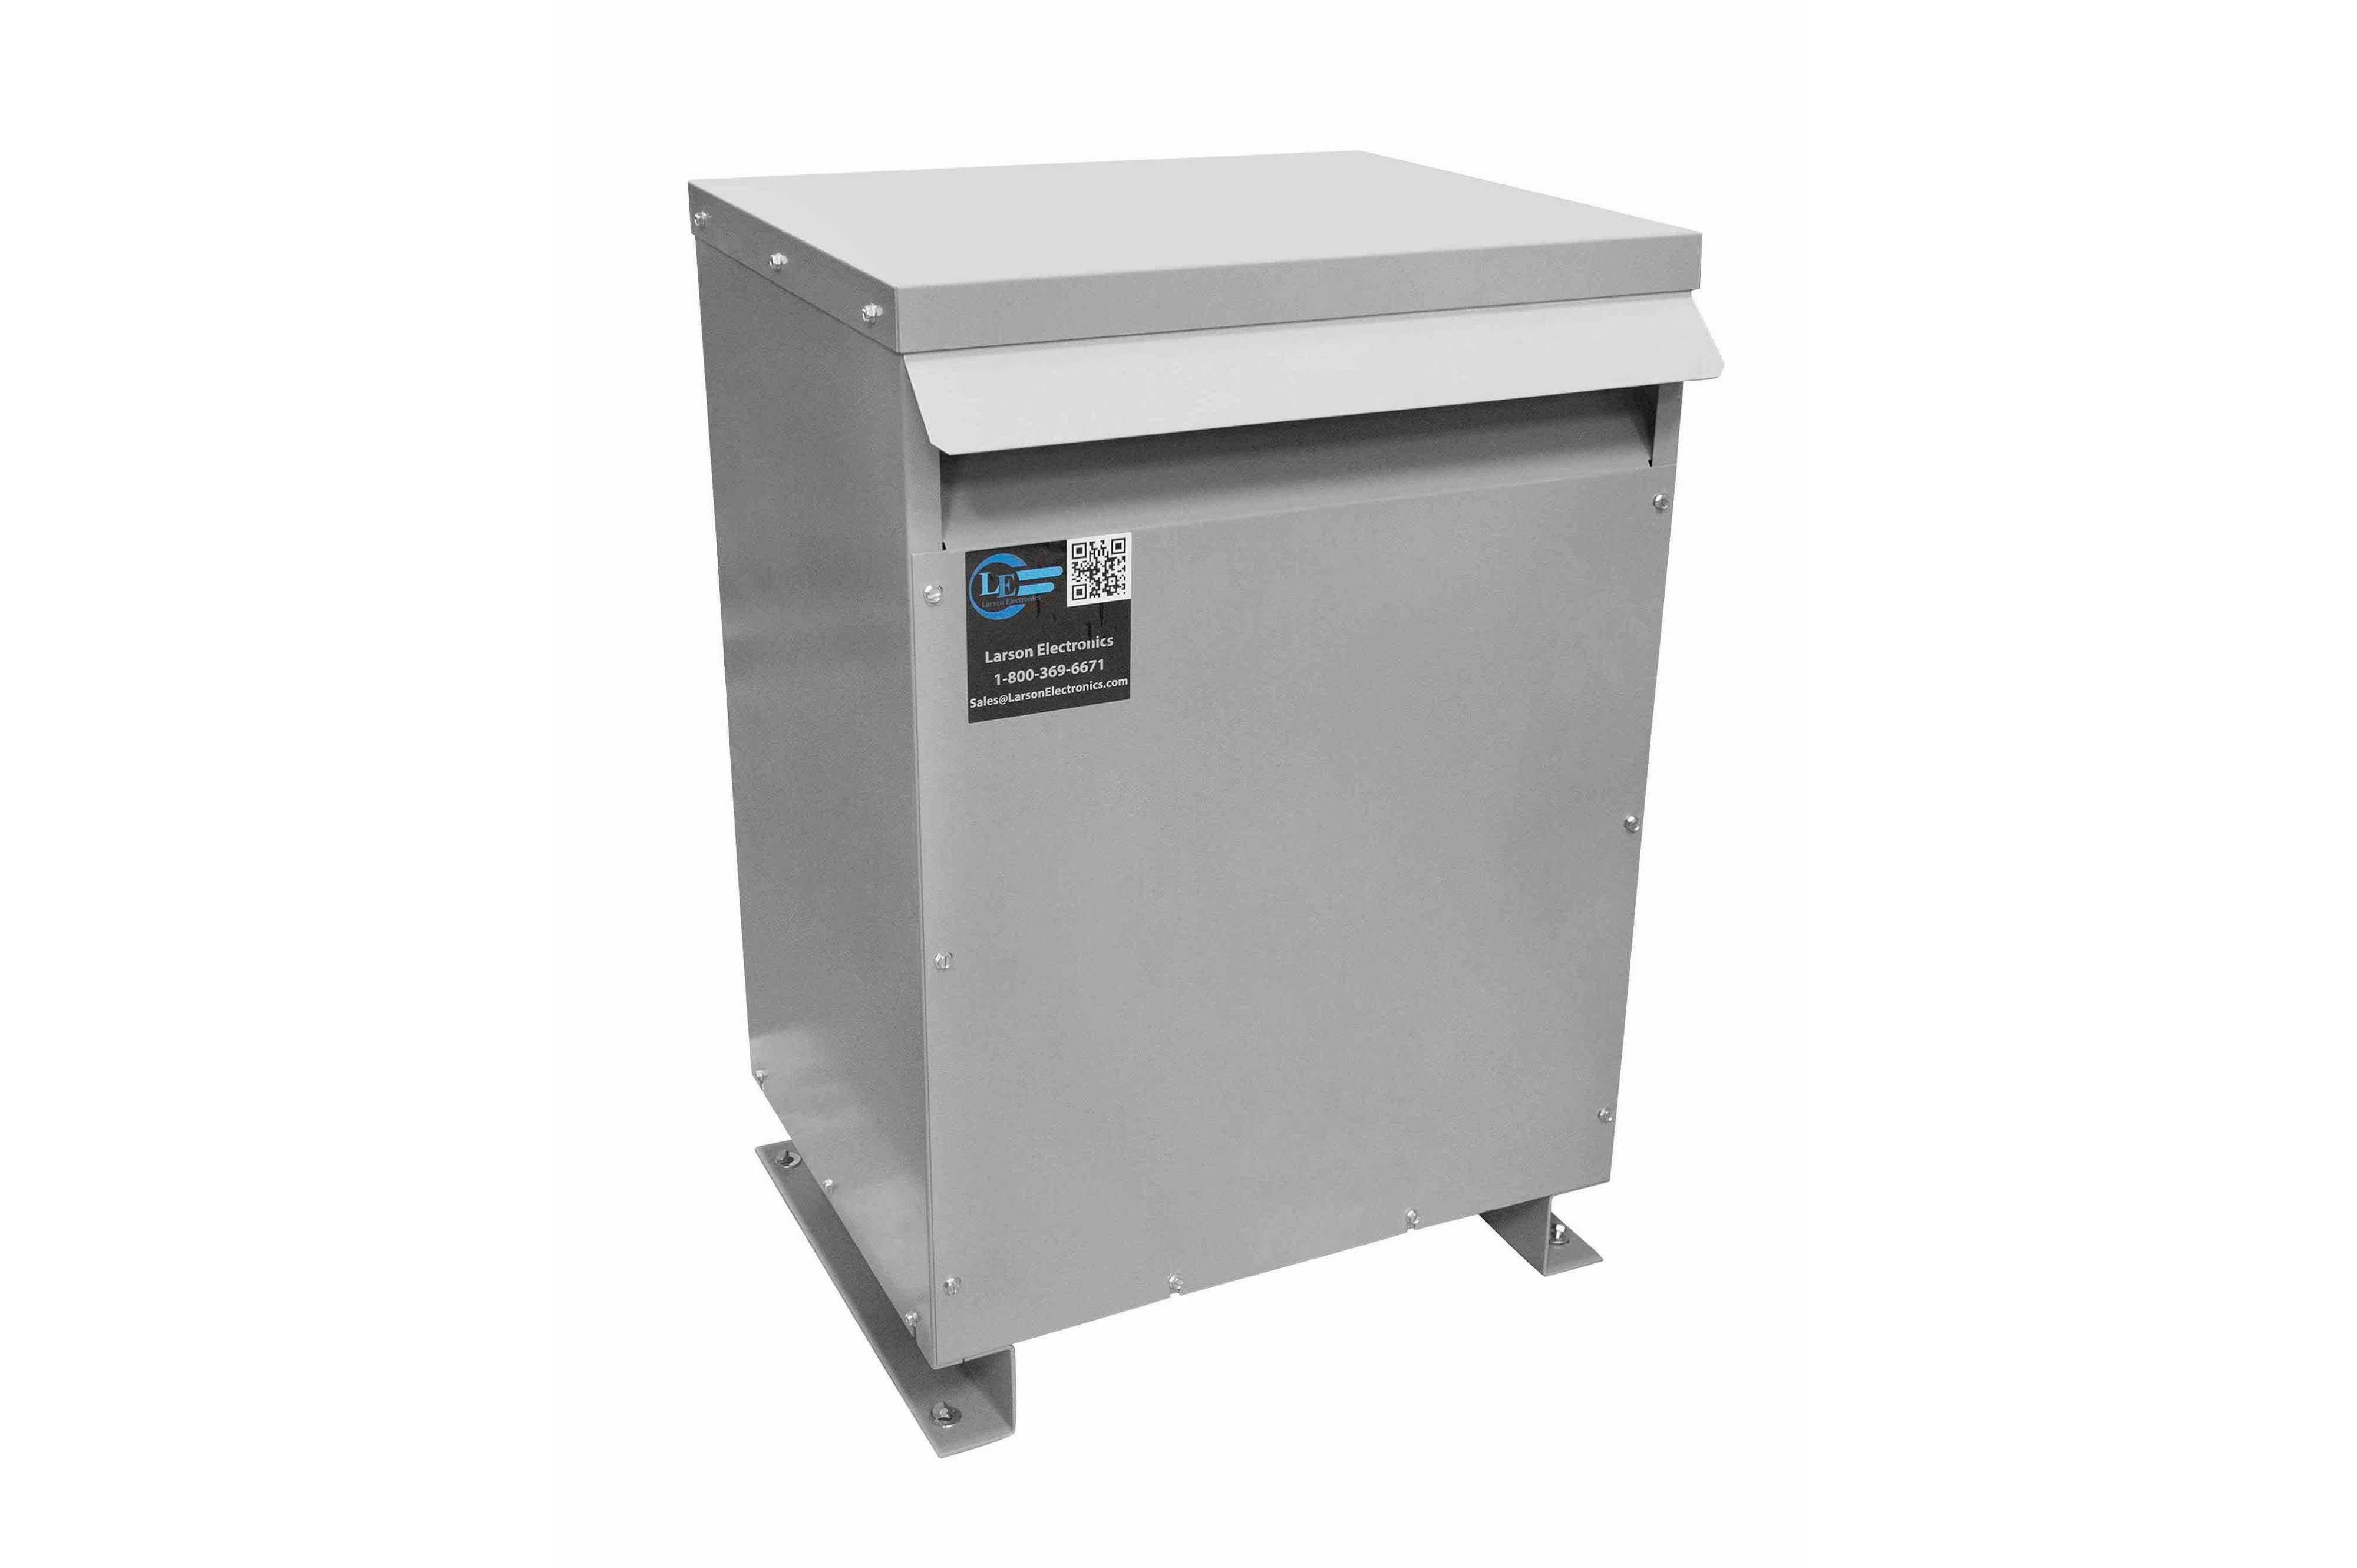 225 kVA 3PH DOE Transformer, 575V Delta Primary, 415Y/240 Wye-N Secondary, N3R, Ventilated, 60 Hz